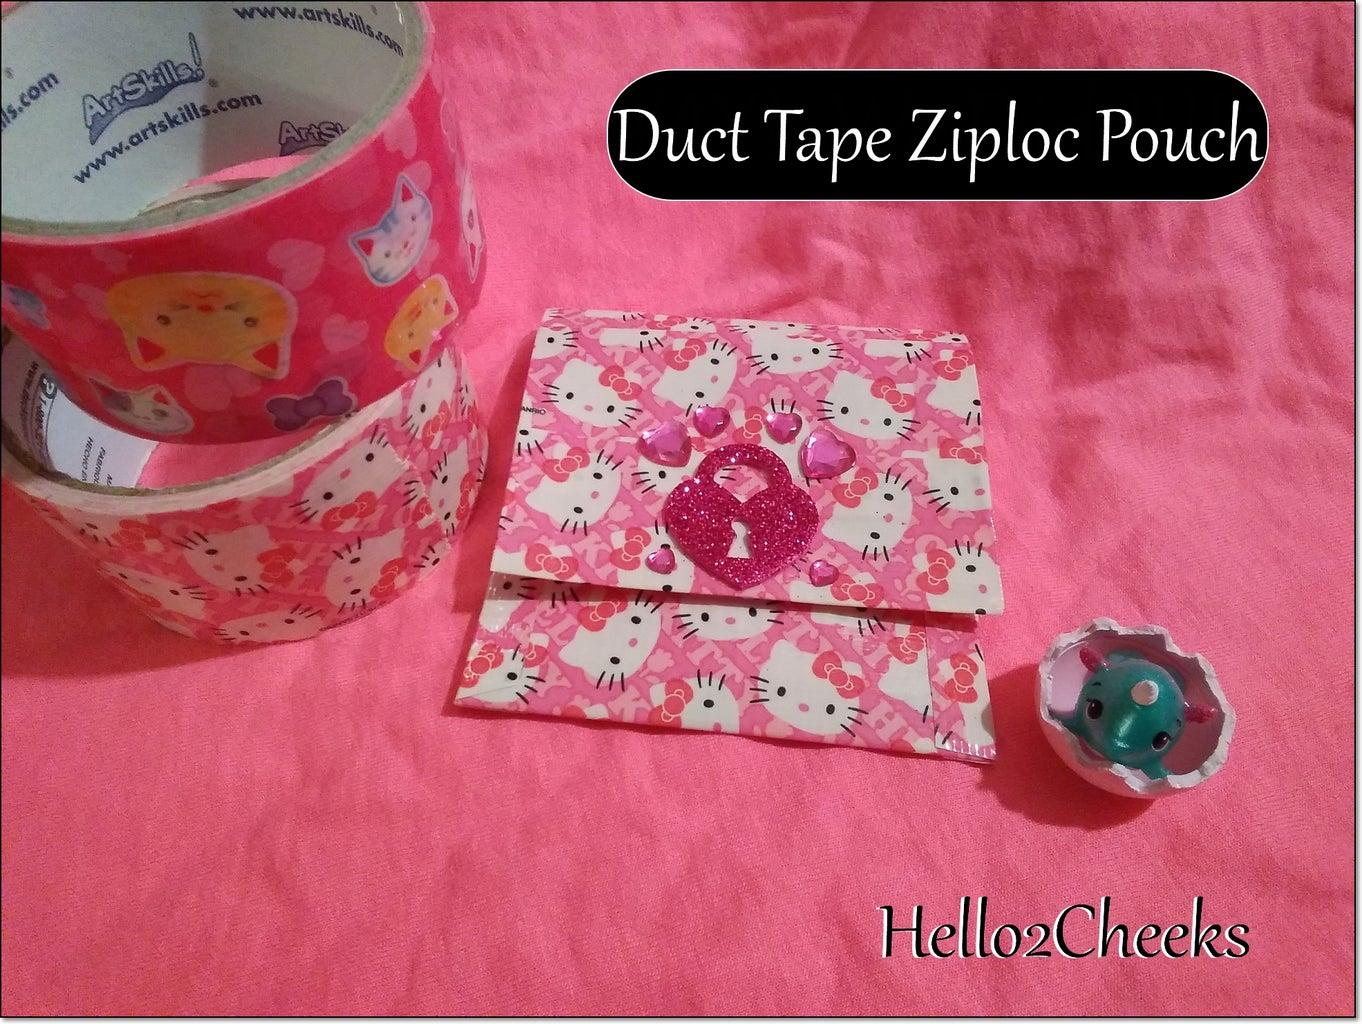 Duct Tape Ziploc Pouch